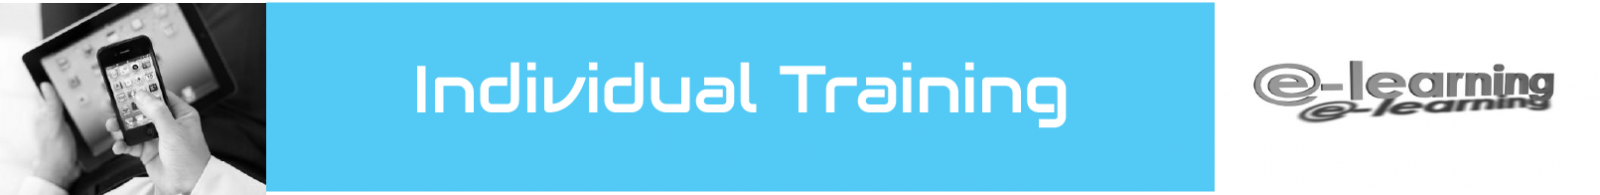 Banner_IndividualTraining_V4